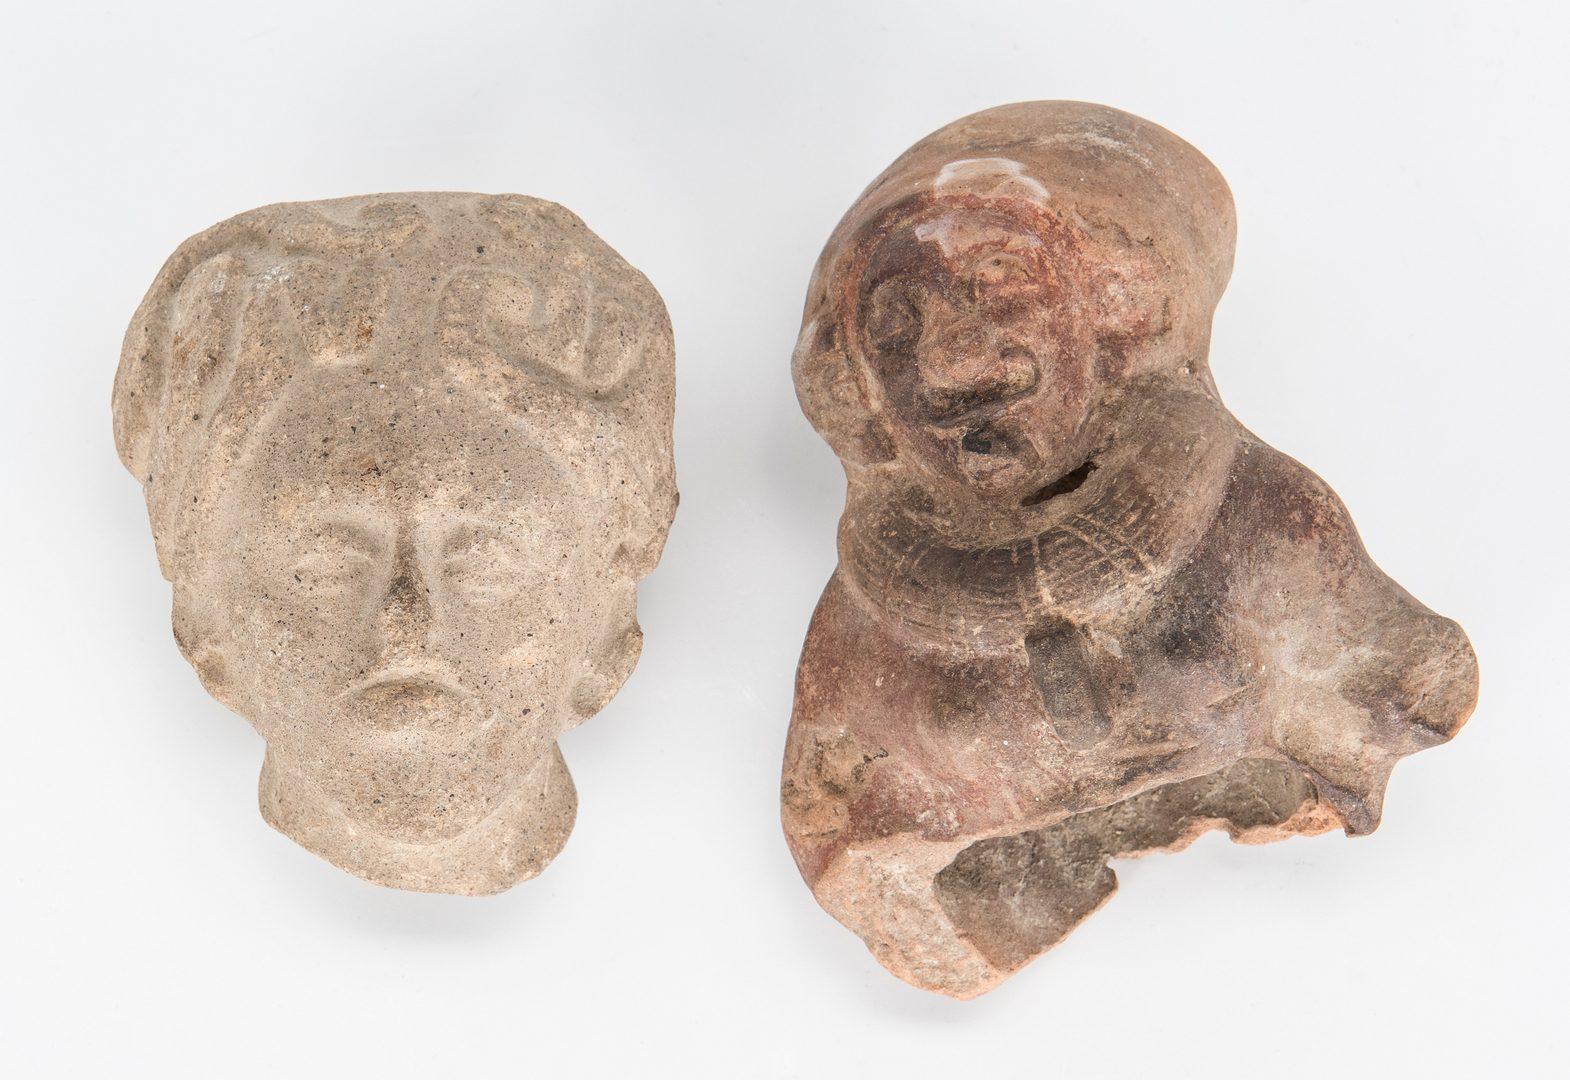 Lot 294: 23 Pre-Columbian Pottery and Stone Human Effigies